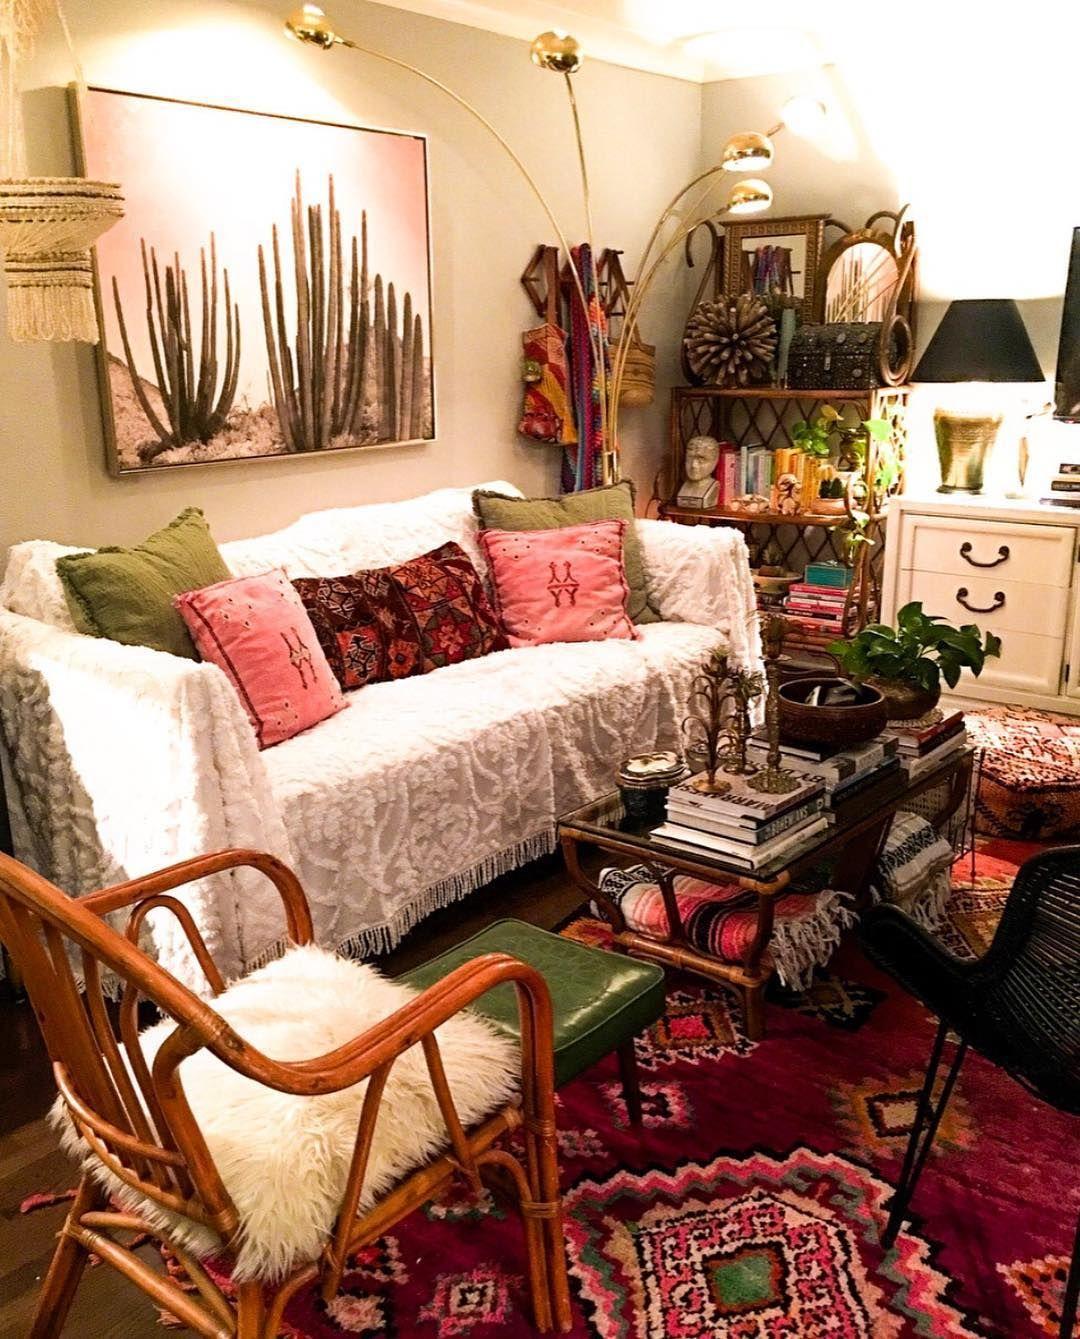 Bohemian Home Decor Stores: 60 Enthralling Bohemian Style Home Decor Ideas